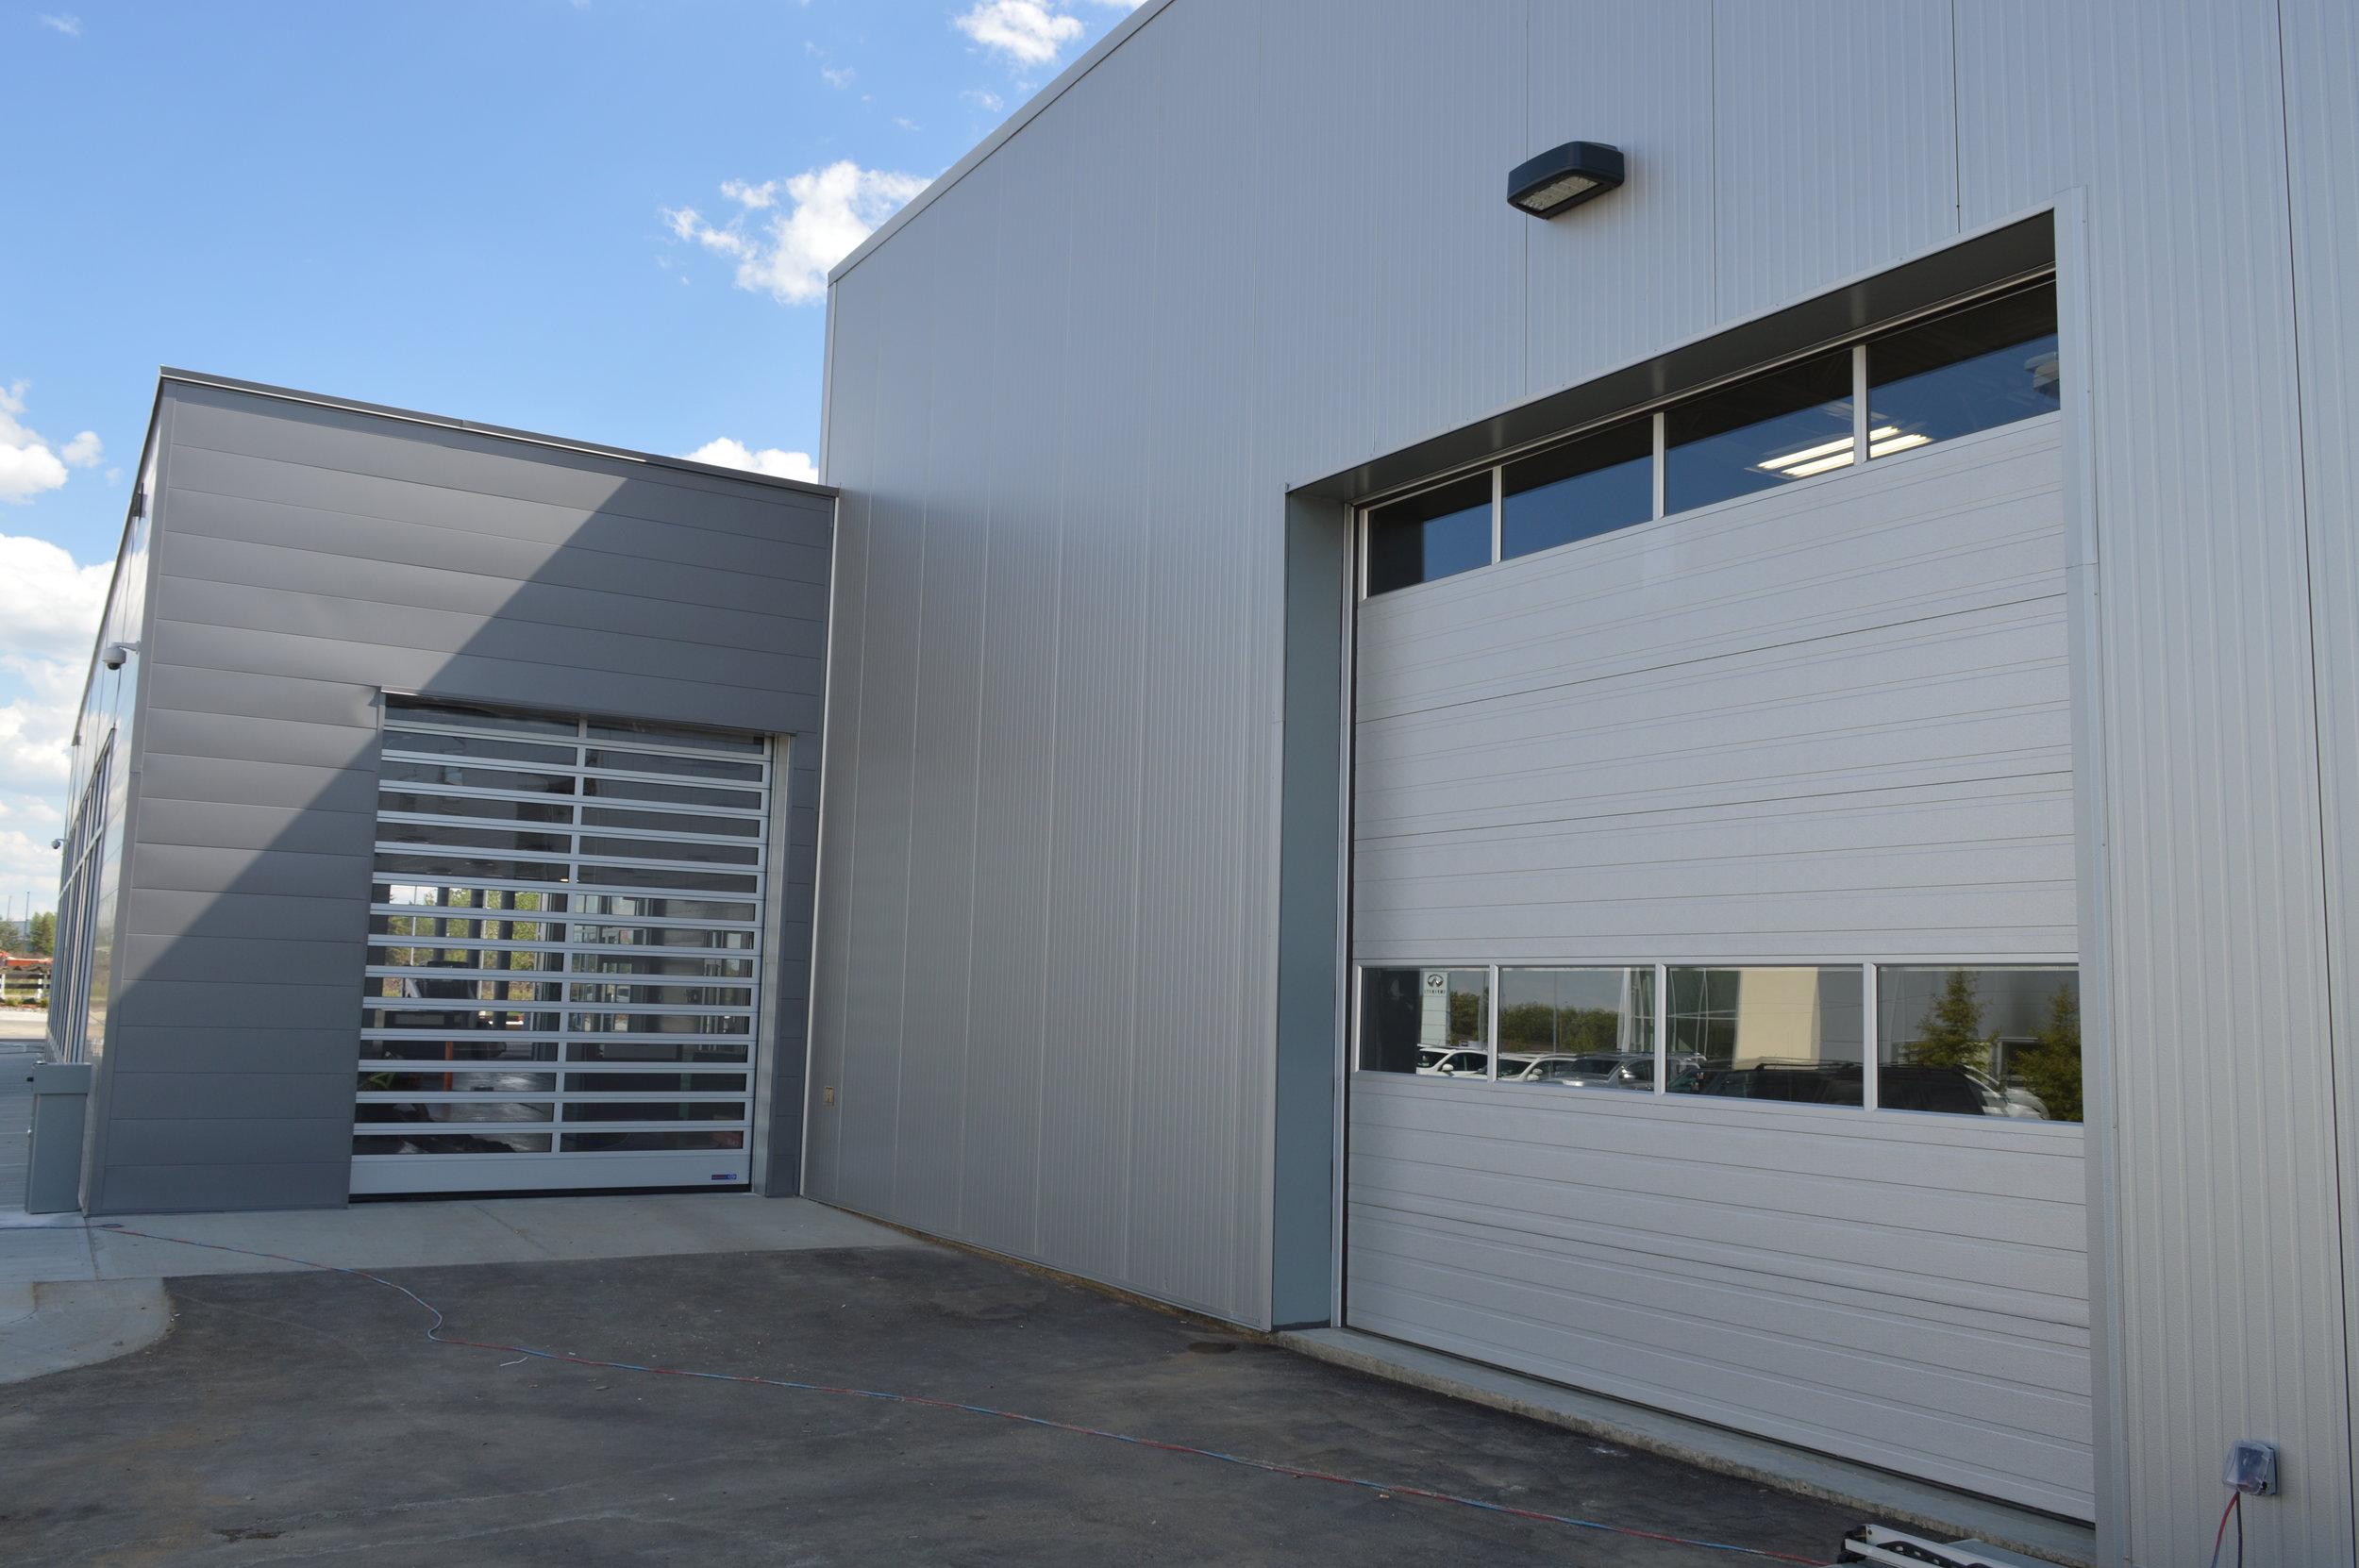 Mercedes-Benz Service Reception - Hormann SG4000